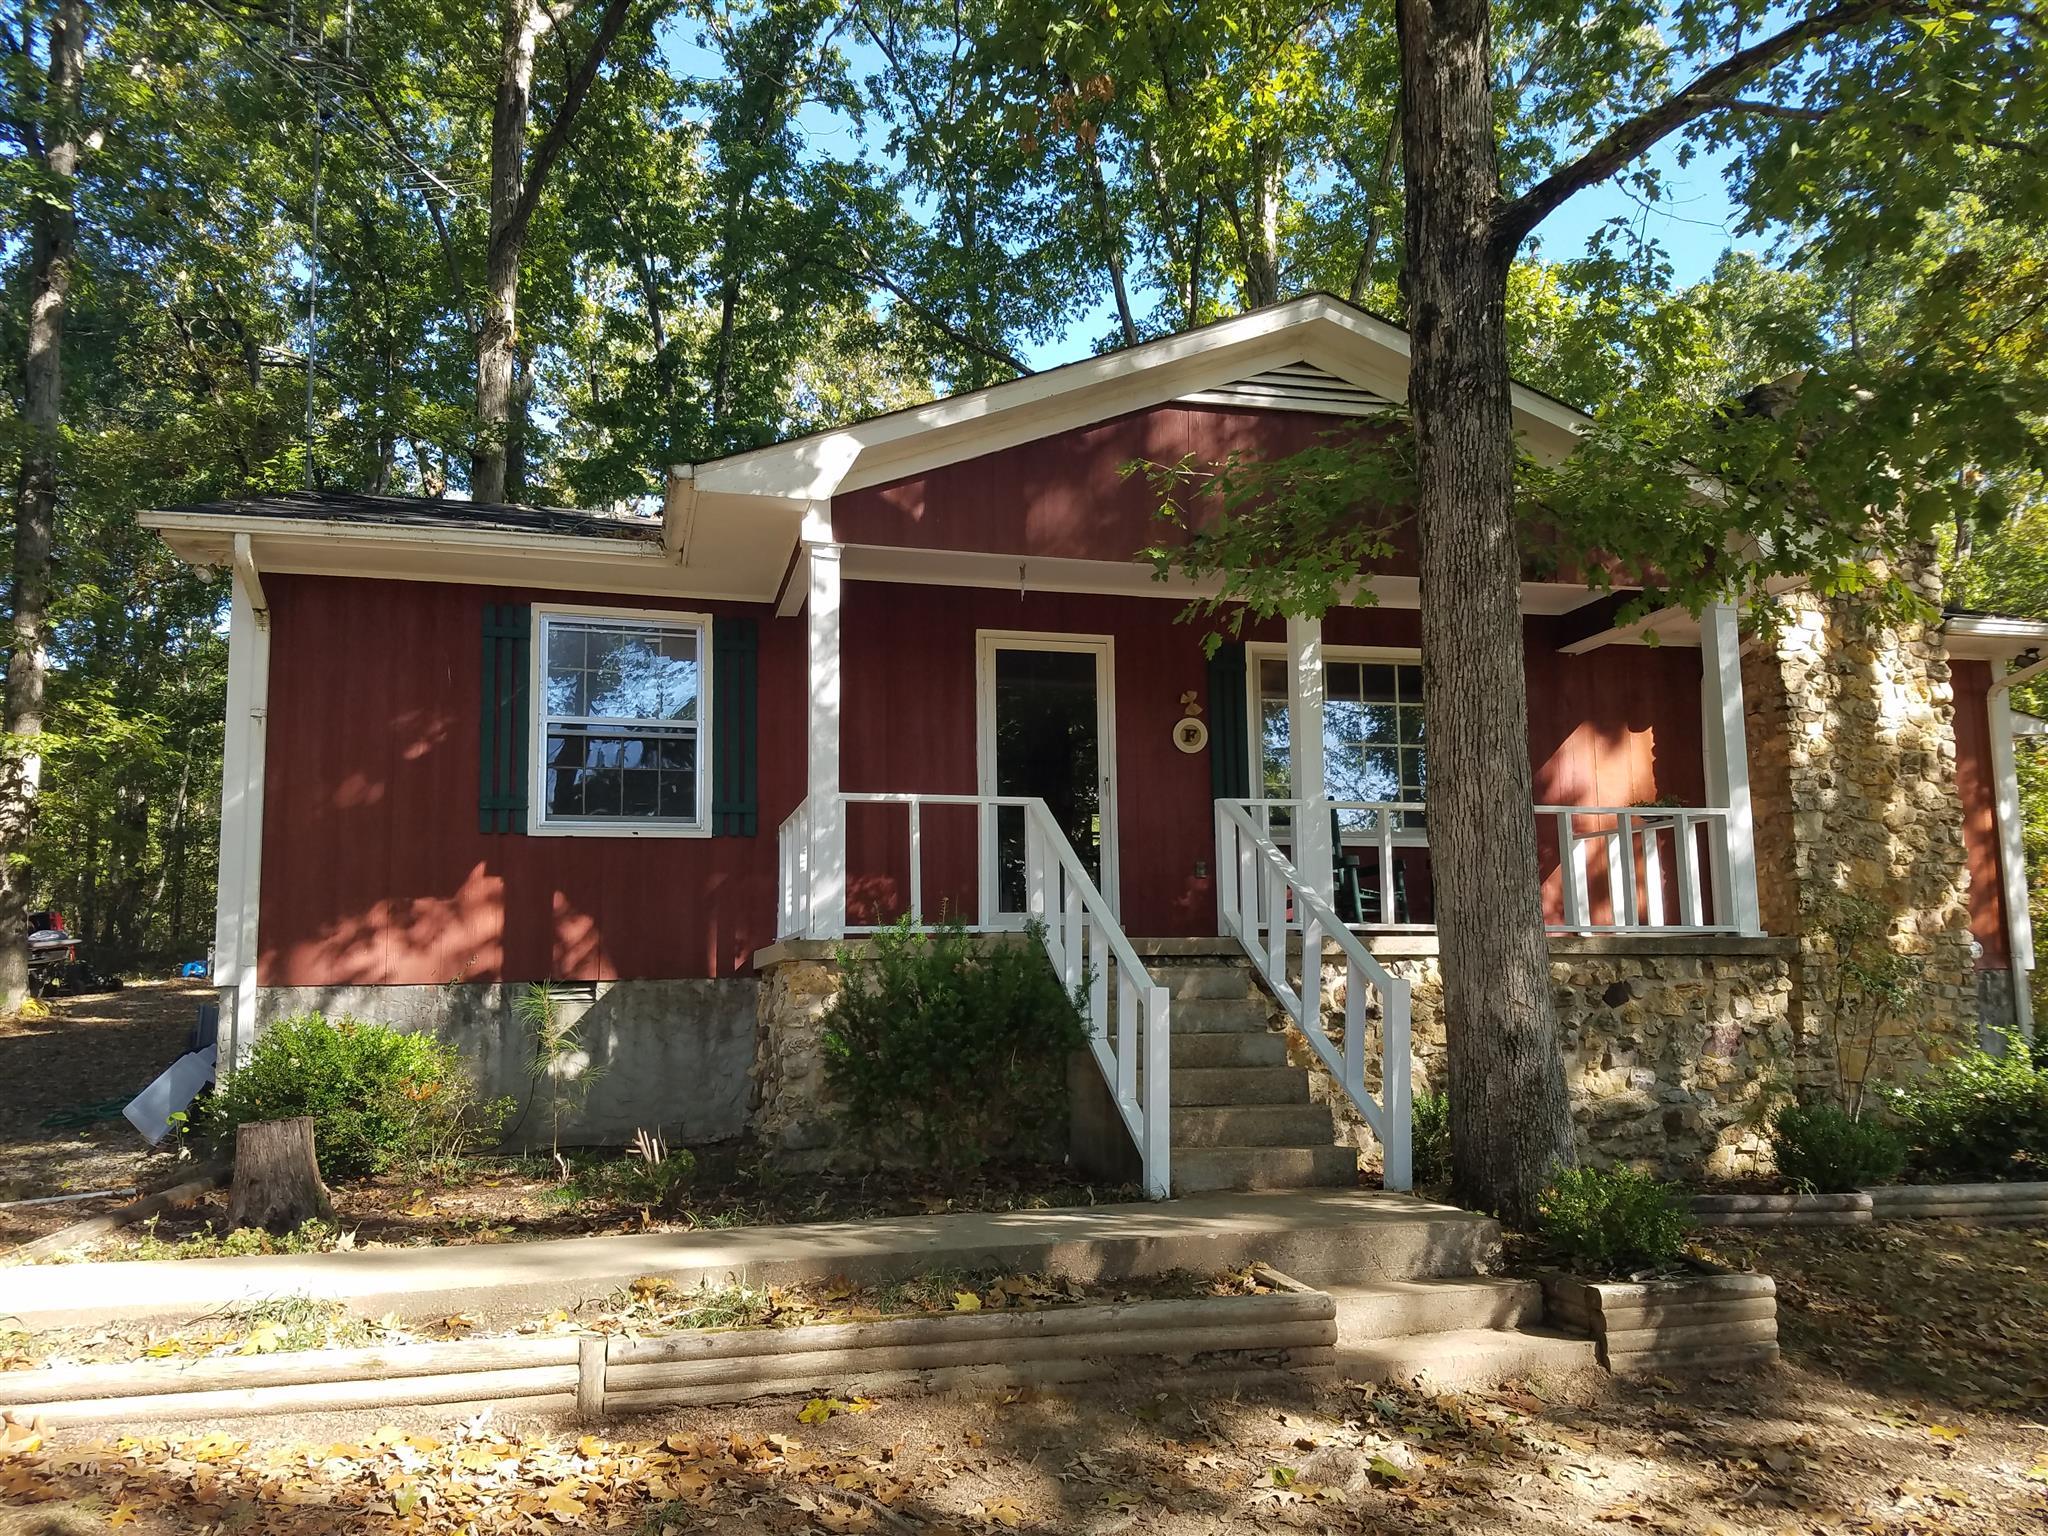 8 E Richardson Rd, Leoma, TN 38468 - Leoma, TN real estate listing